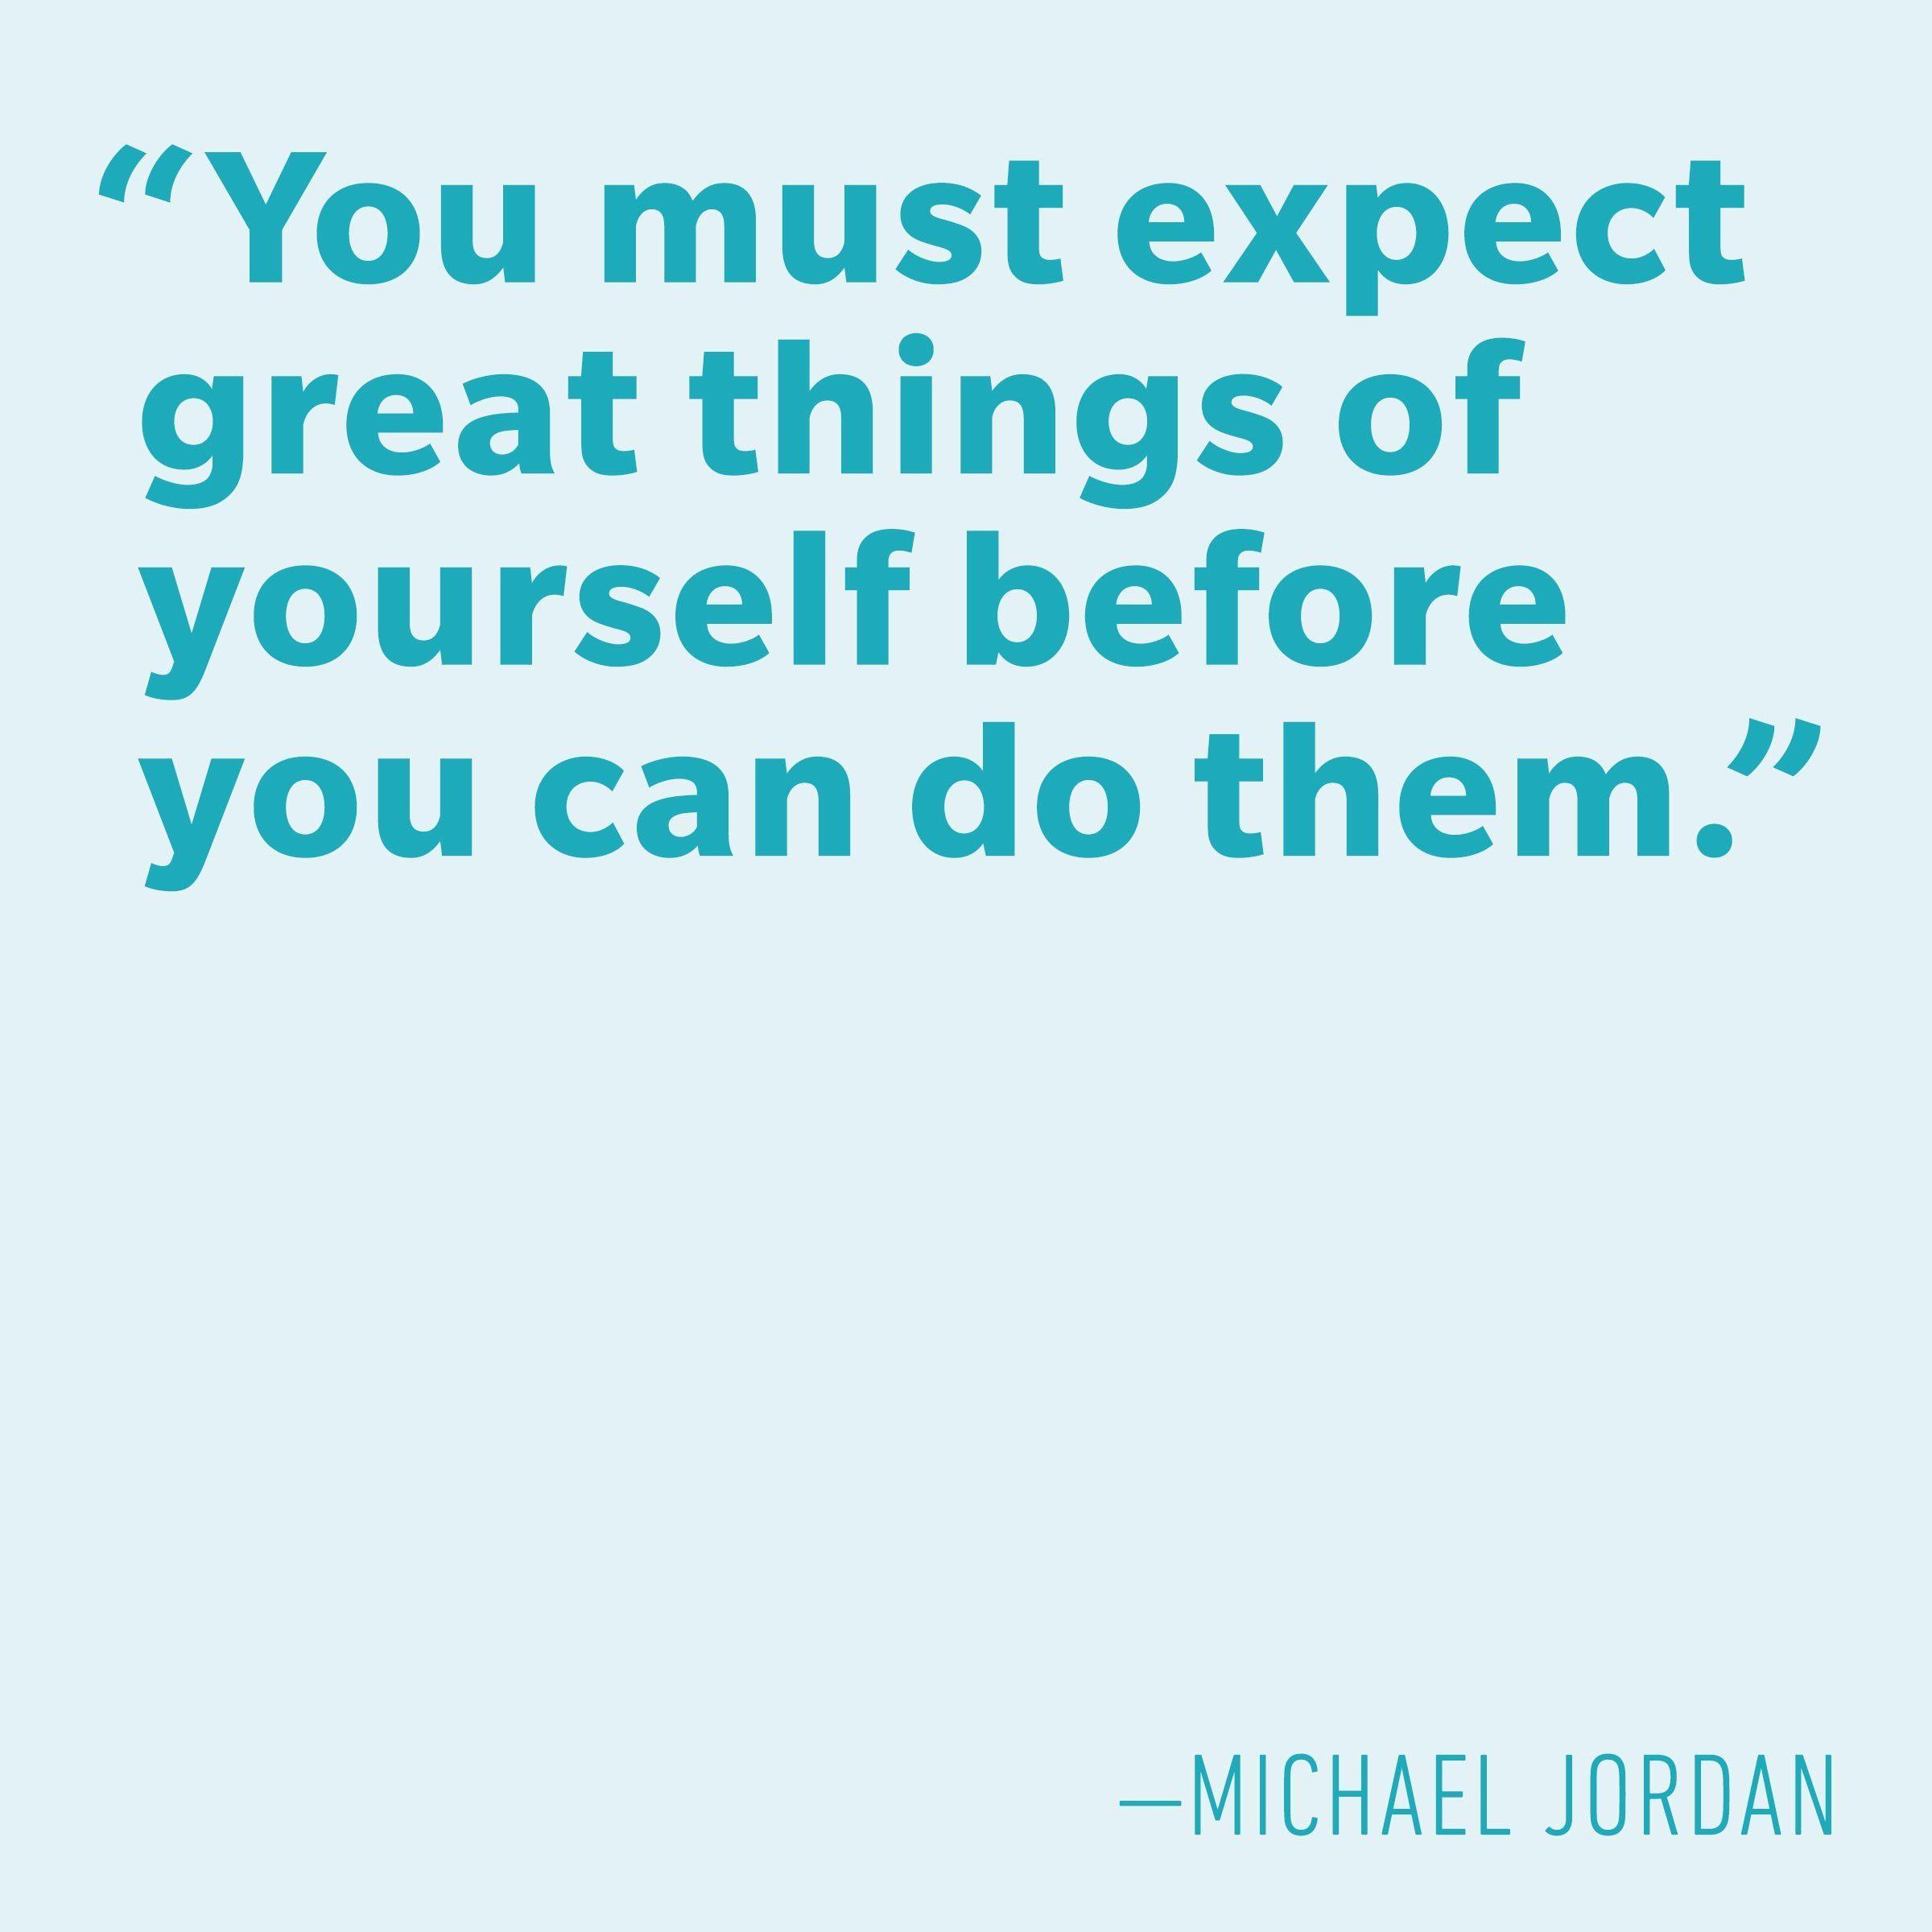 Motivational quotes - Michael Jordan